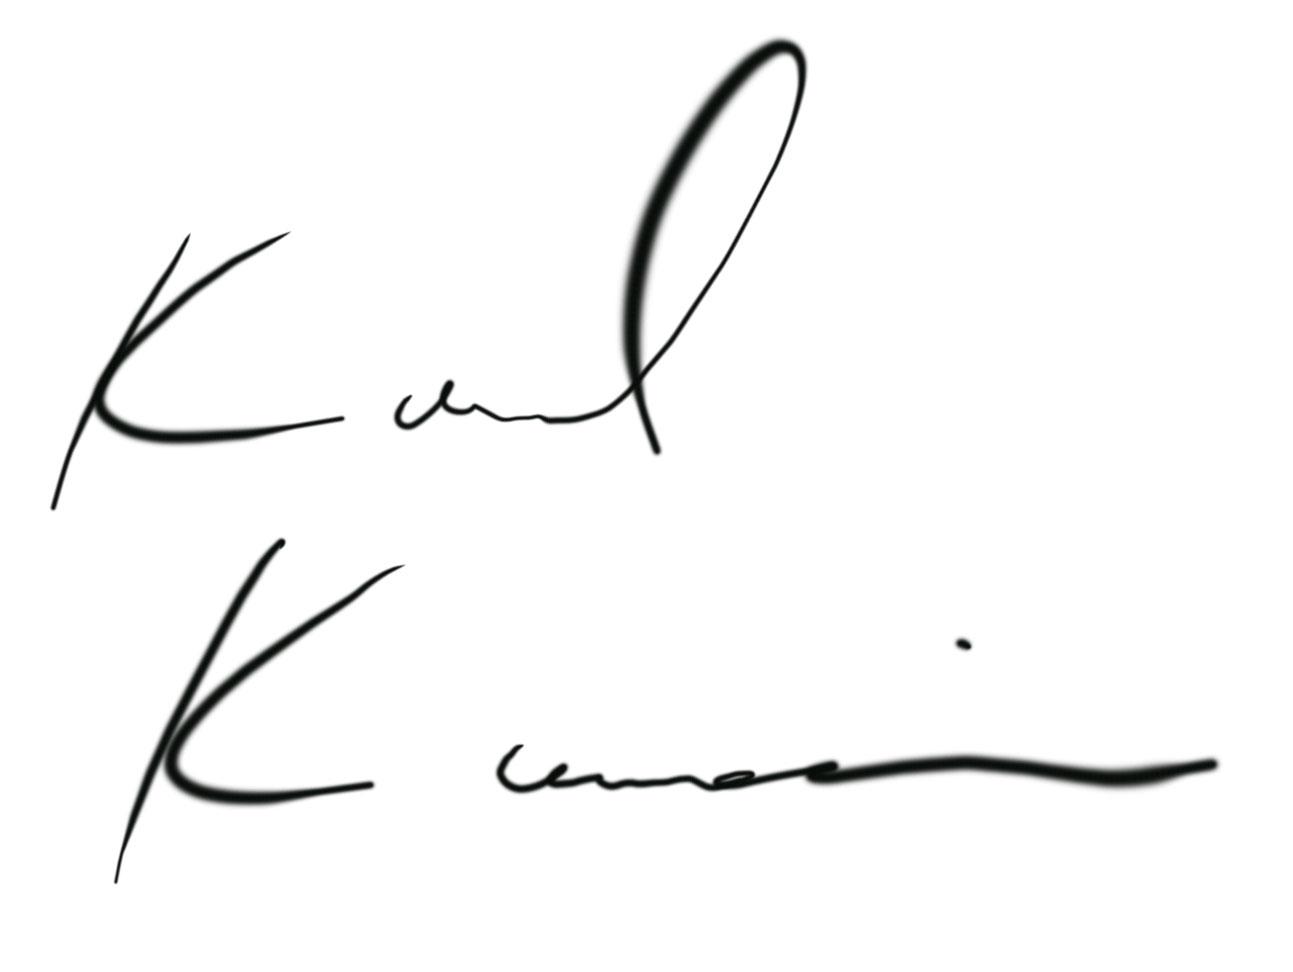 Karl Kanai's Signature